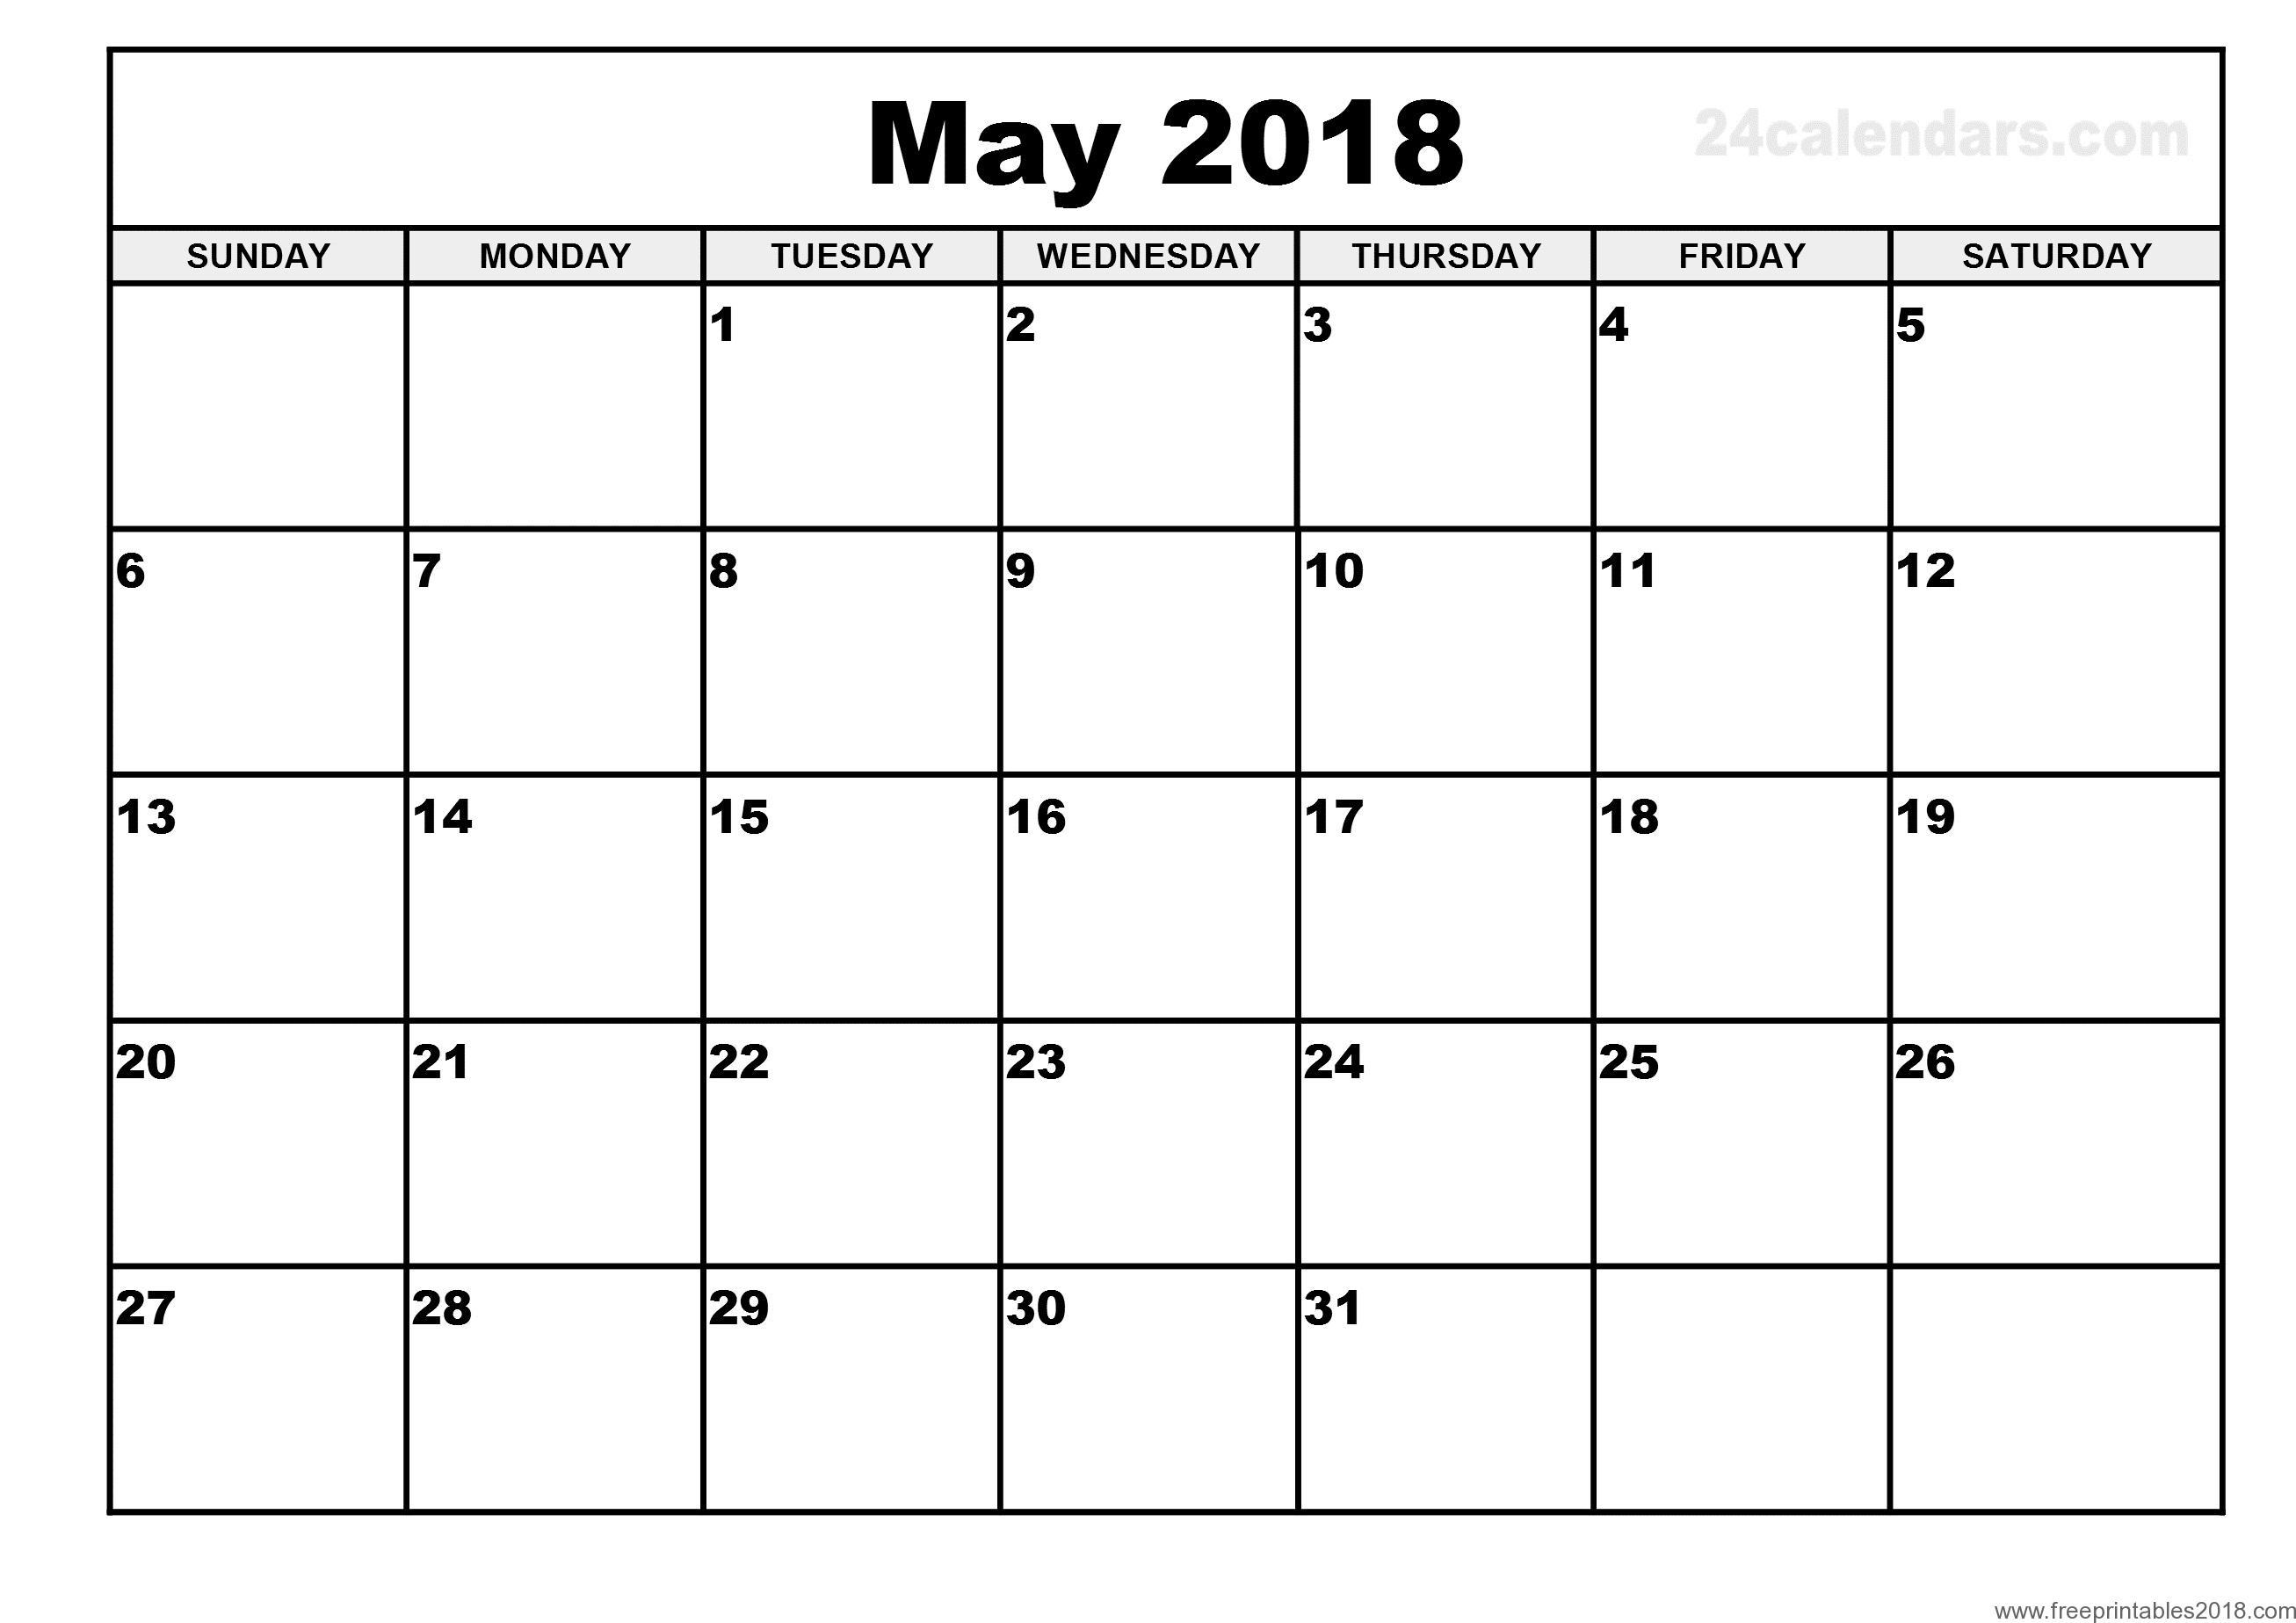 Free Printable Calendar May 2018 | Free Printables 2019